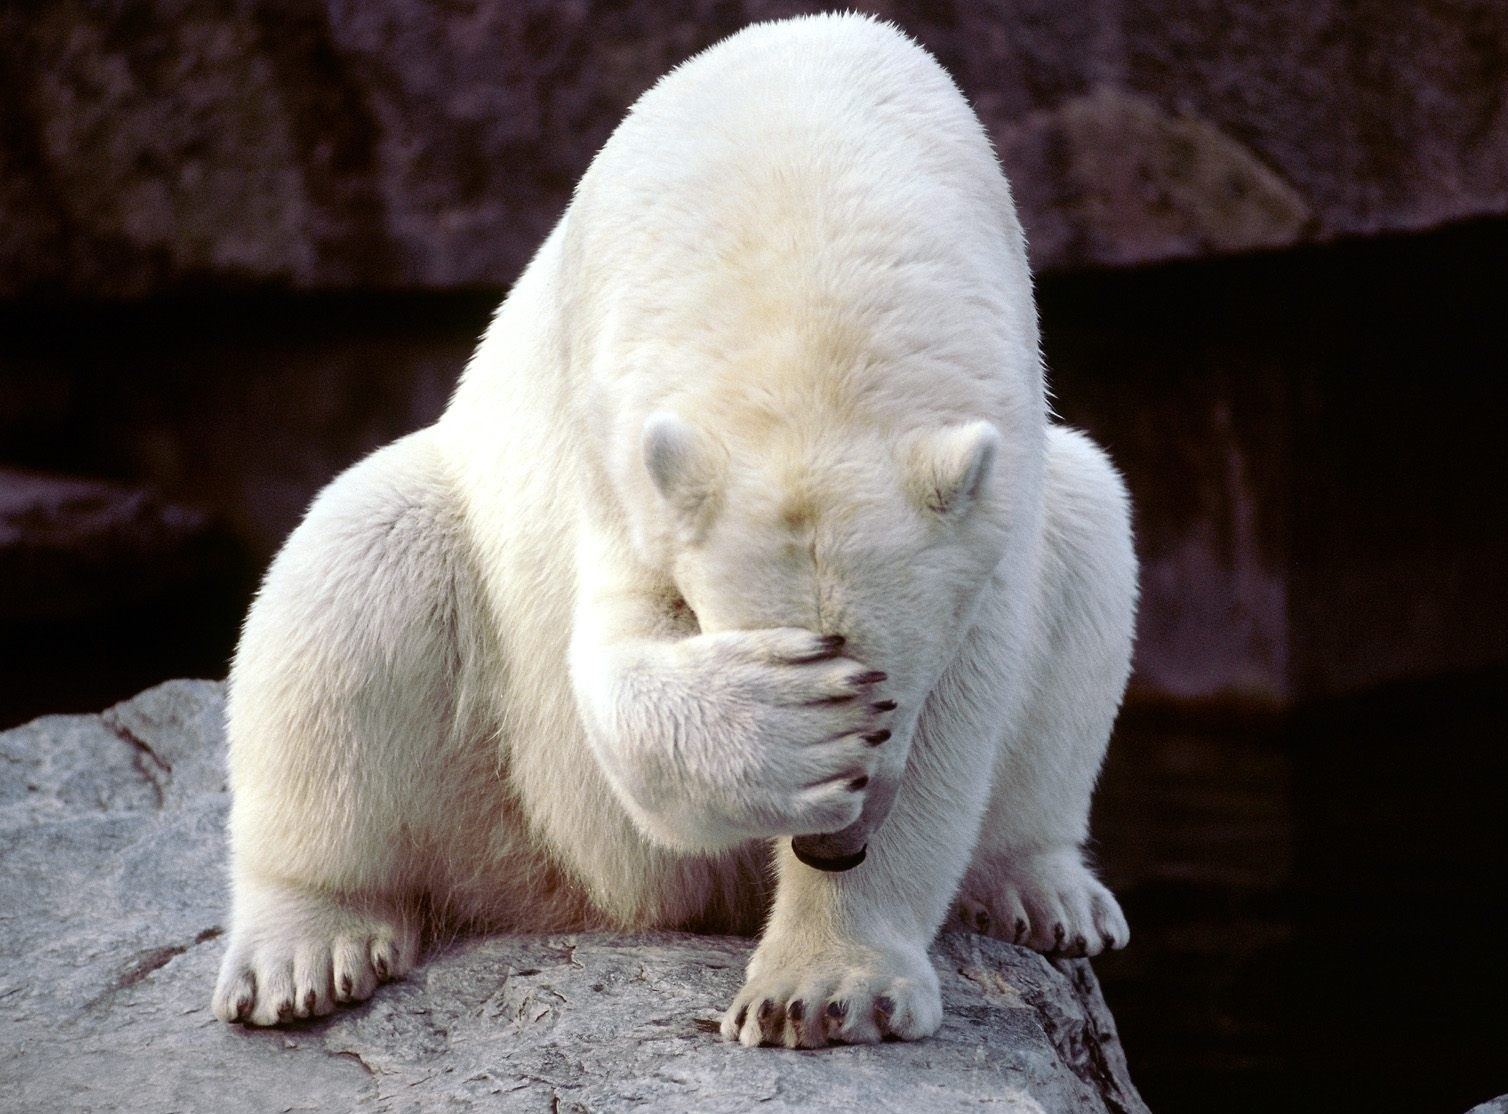 frustrated_bear-558697-edited.jpg